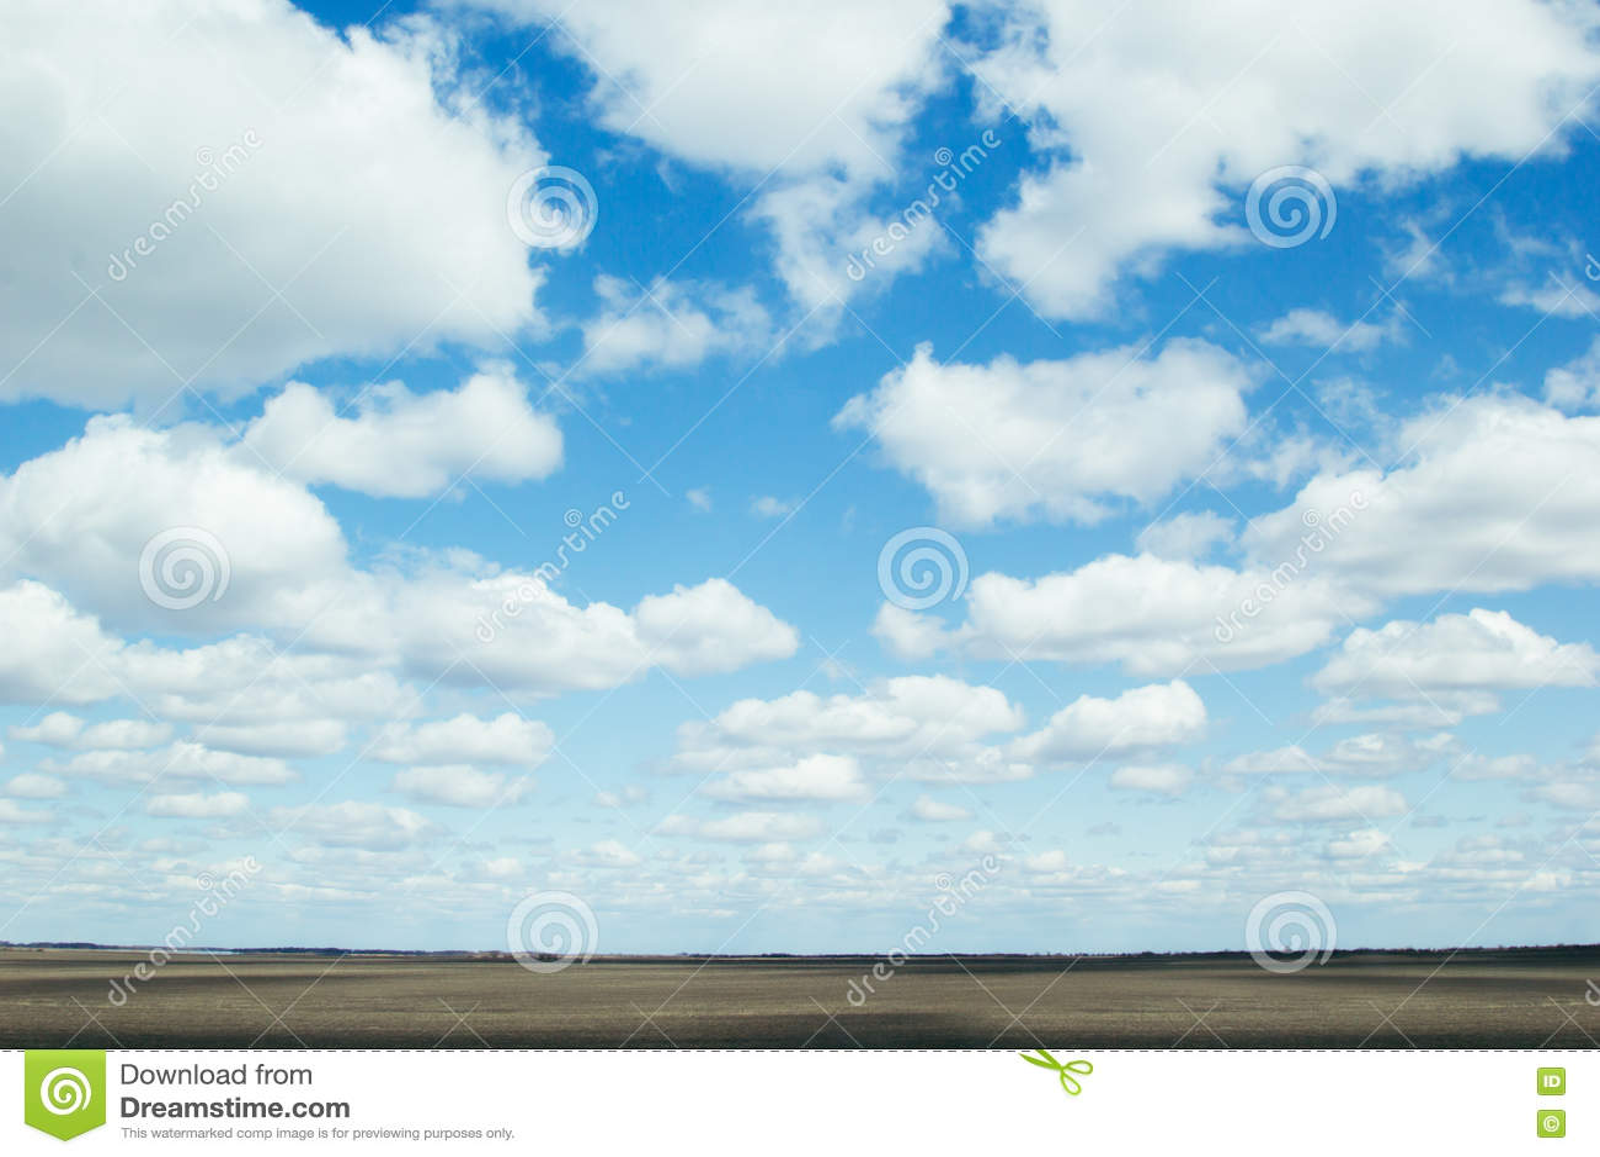 Предпосылка голубого неба с мягкими шелковистыми облаками и прокладка field